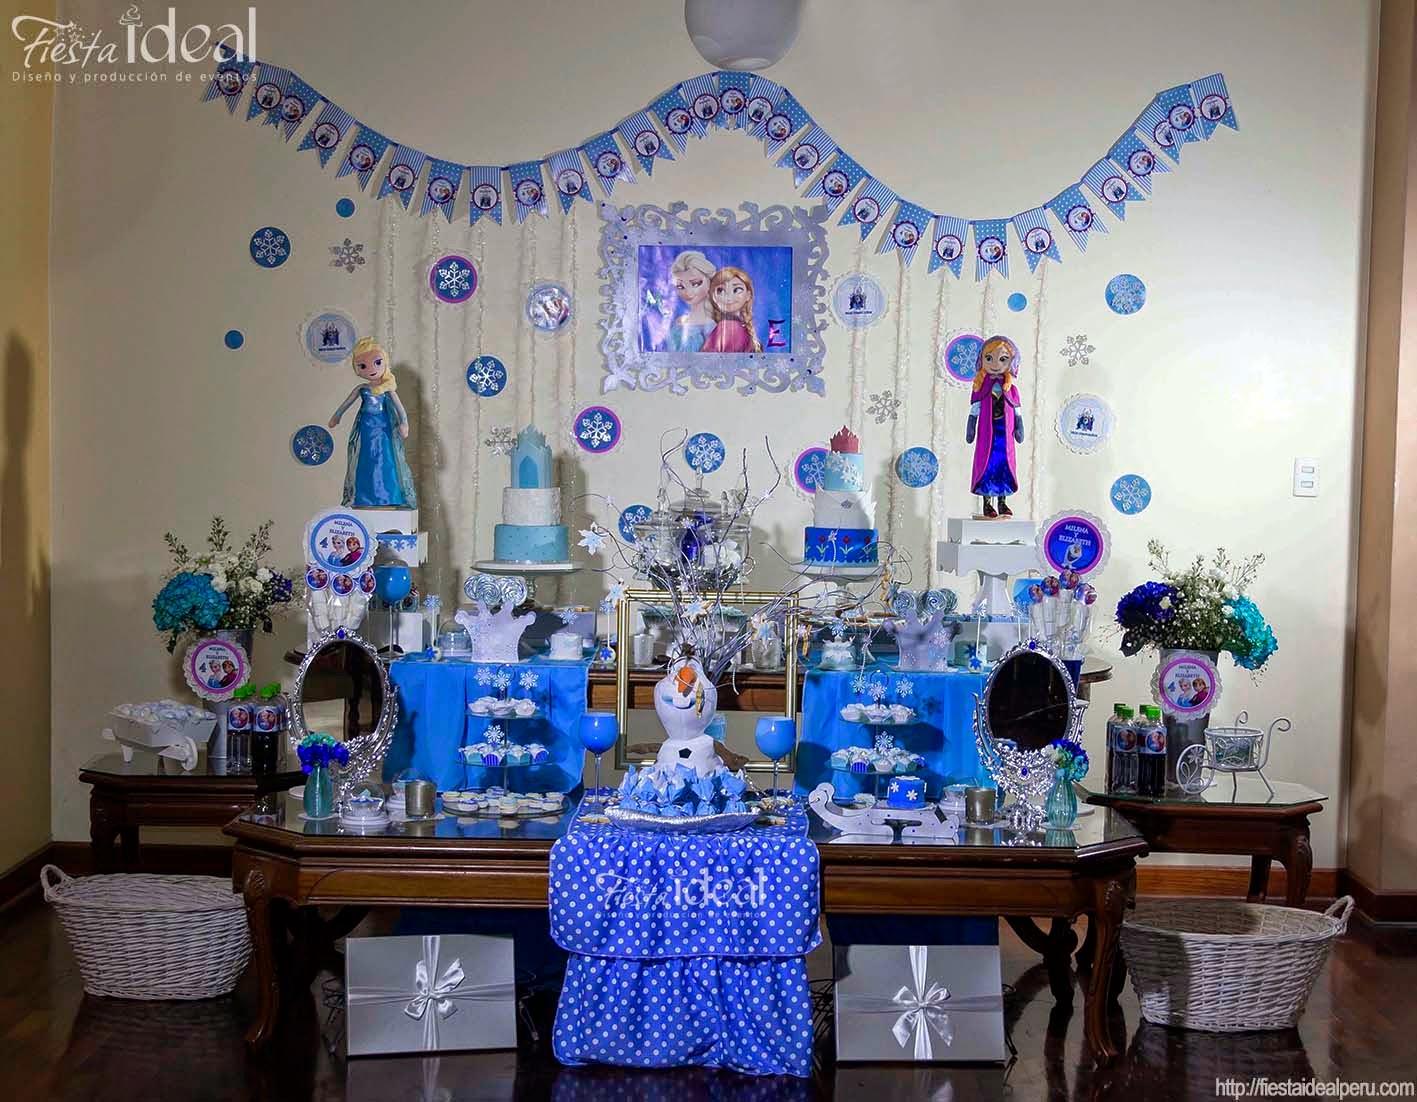 Fiesta ideal peru frozen fiesta tem tica decoraci n - Decoracion fiestas cumpleanos ...